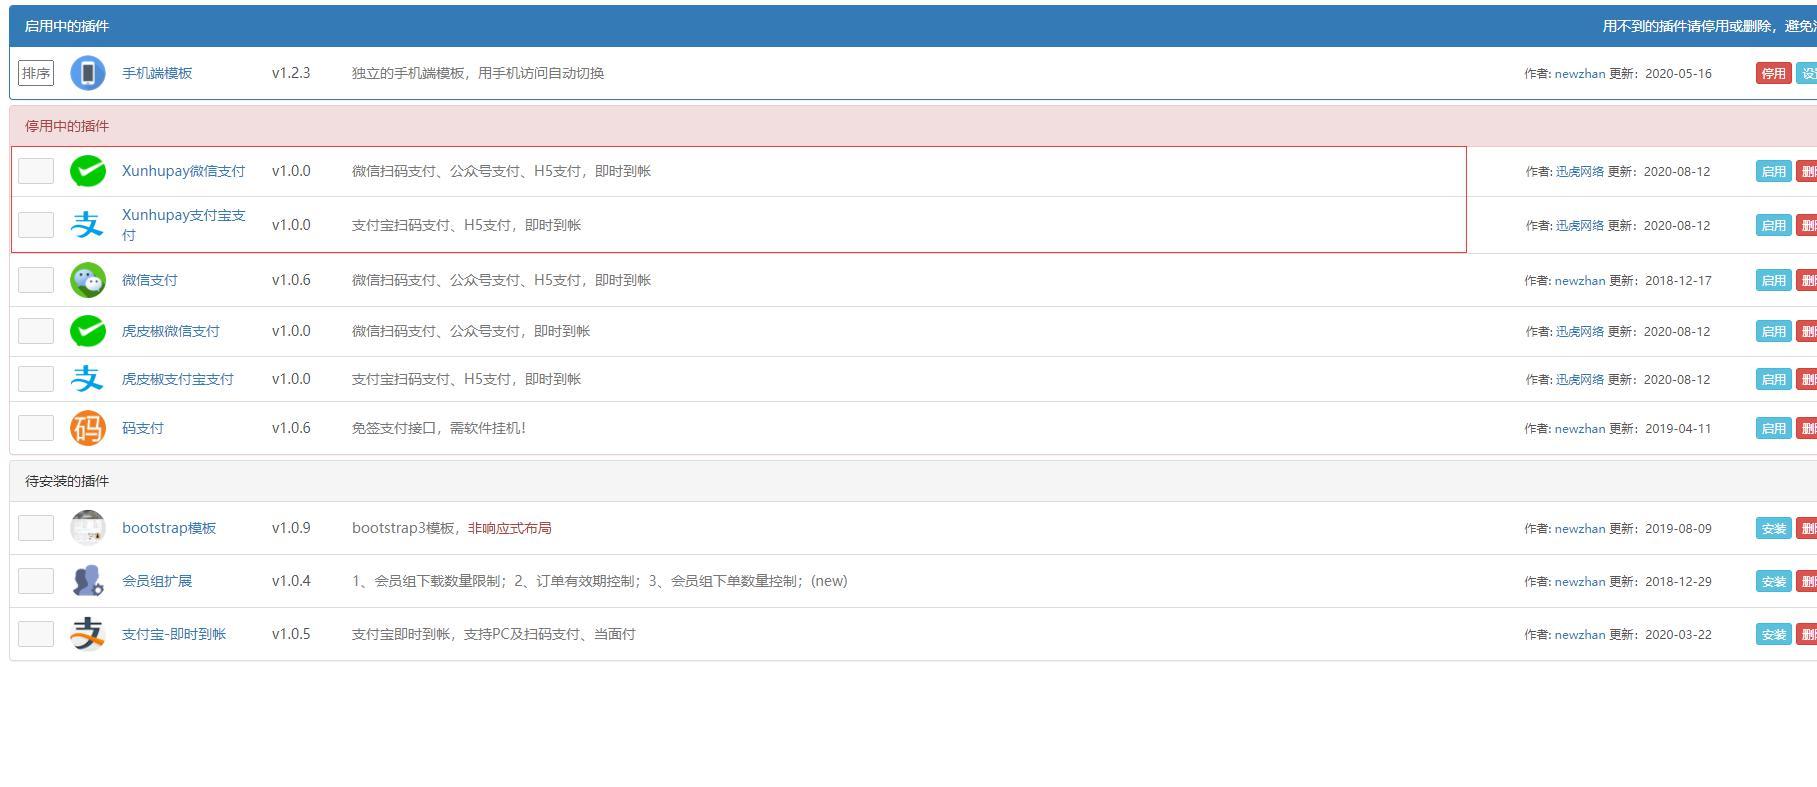 NZCMS 源码下载系统使用微信H5支付教程